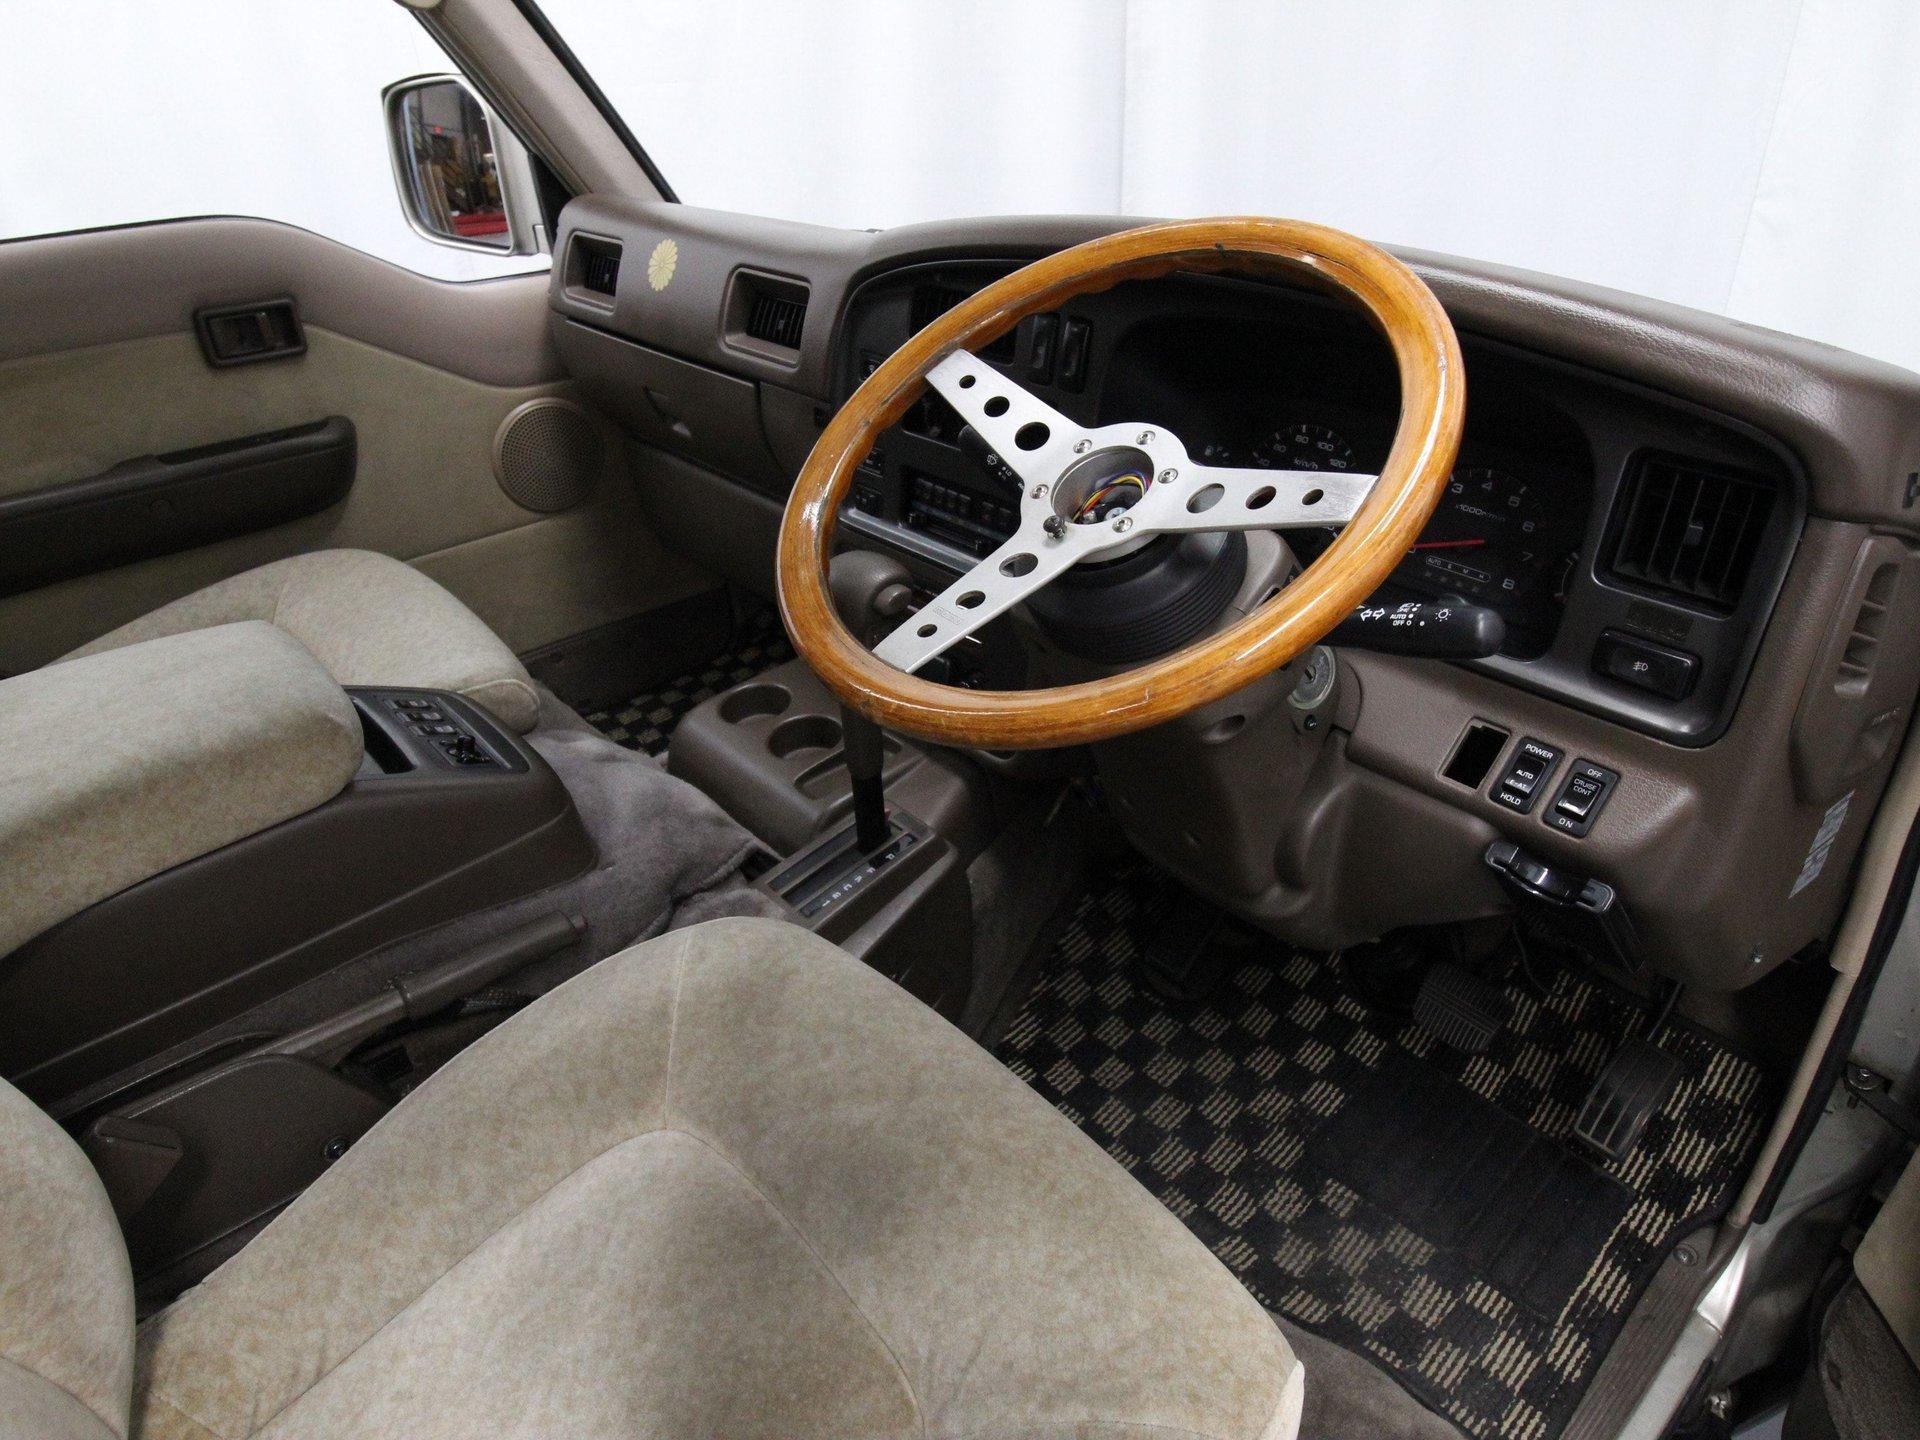 1993 Nissan Homy